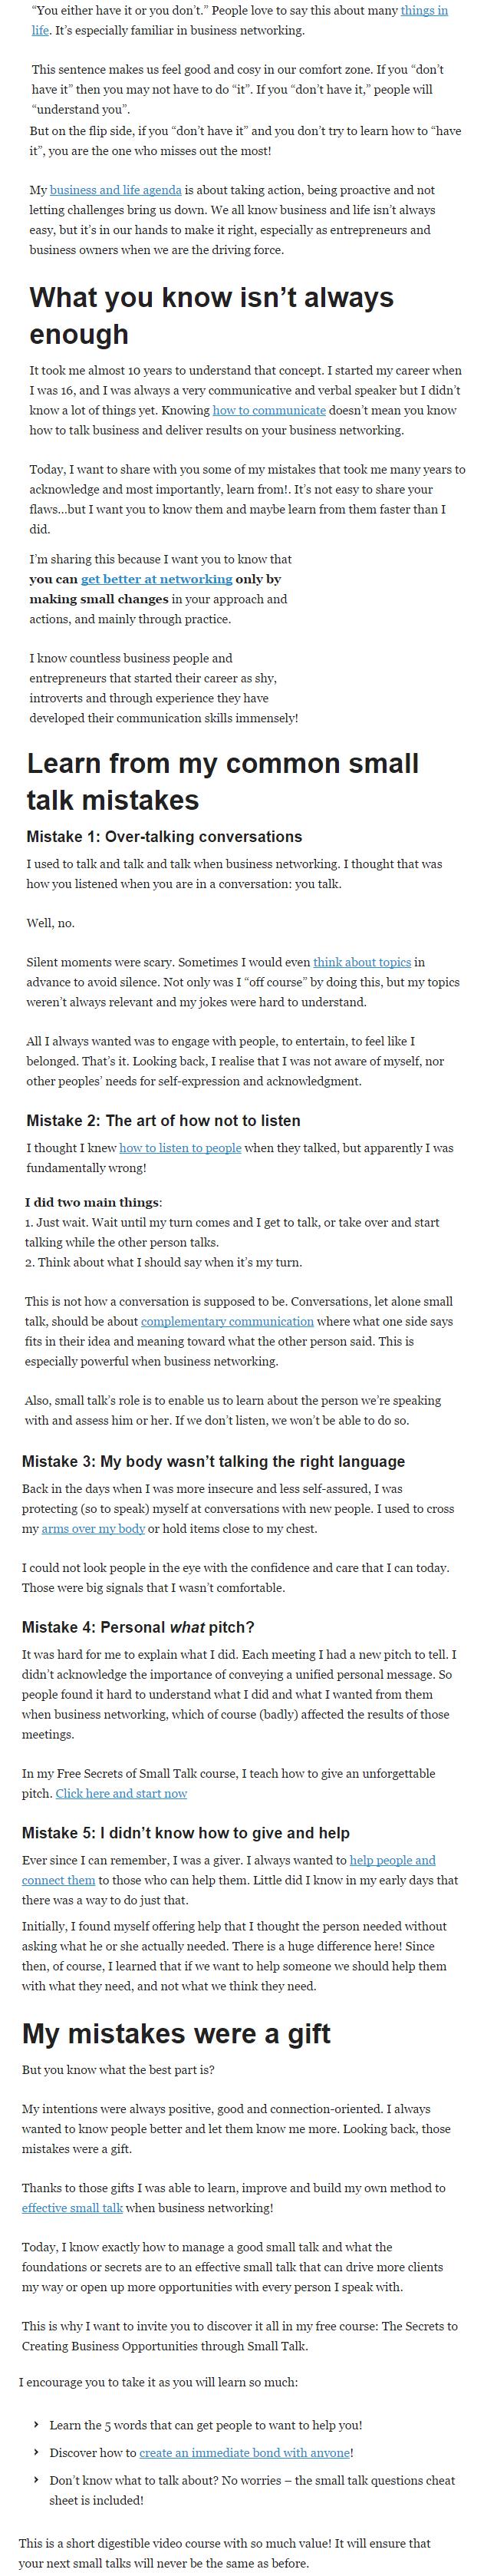 Small talk article_